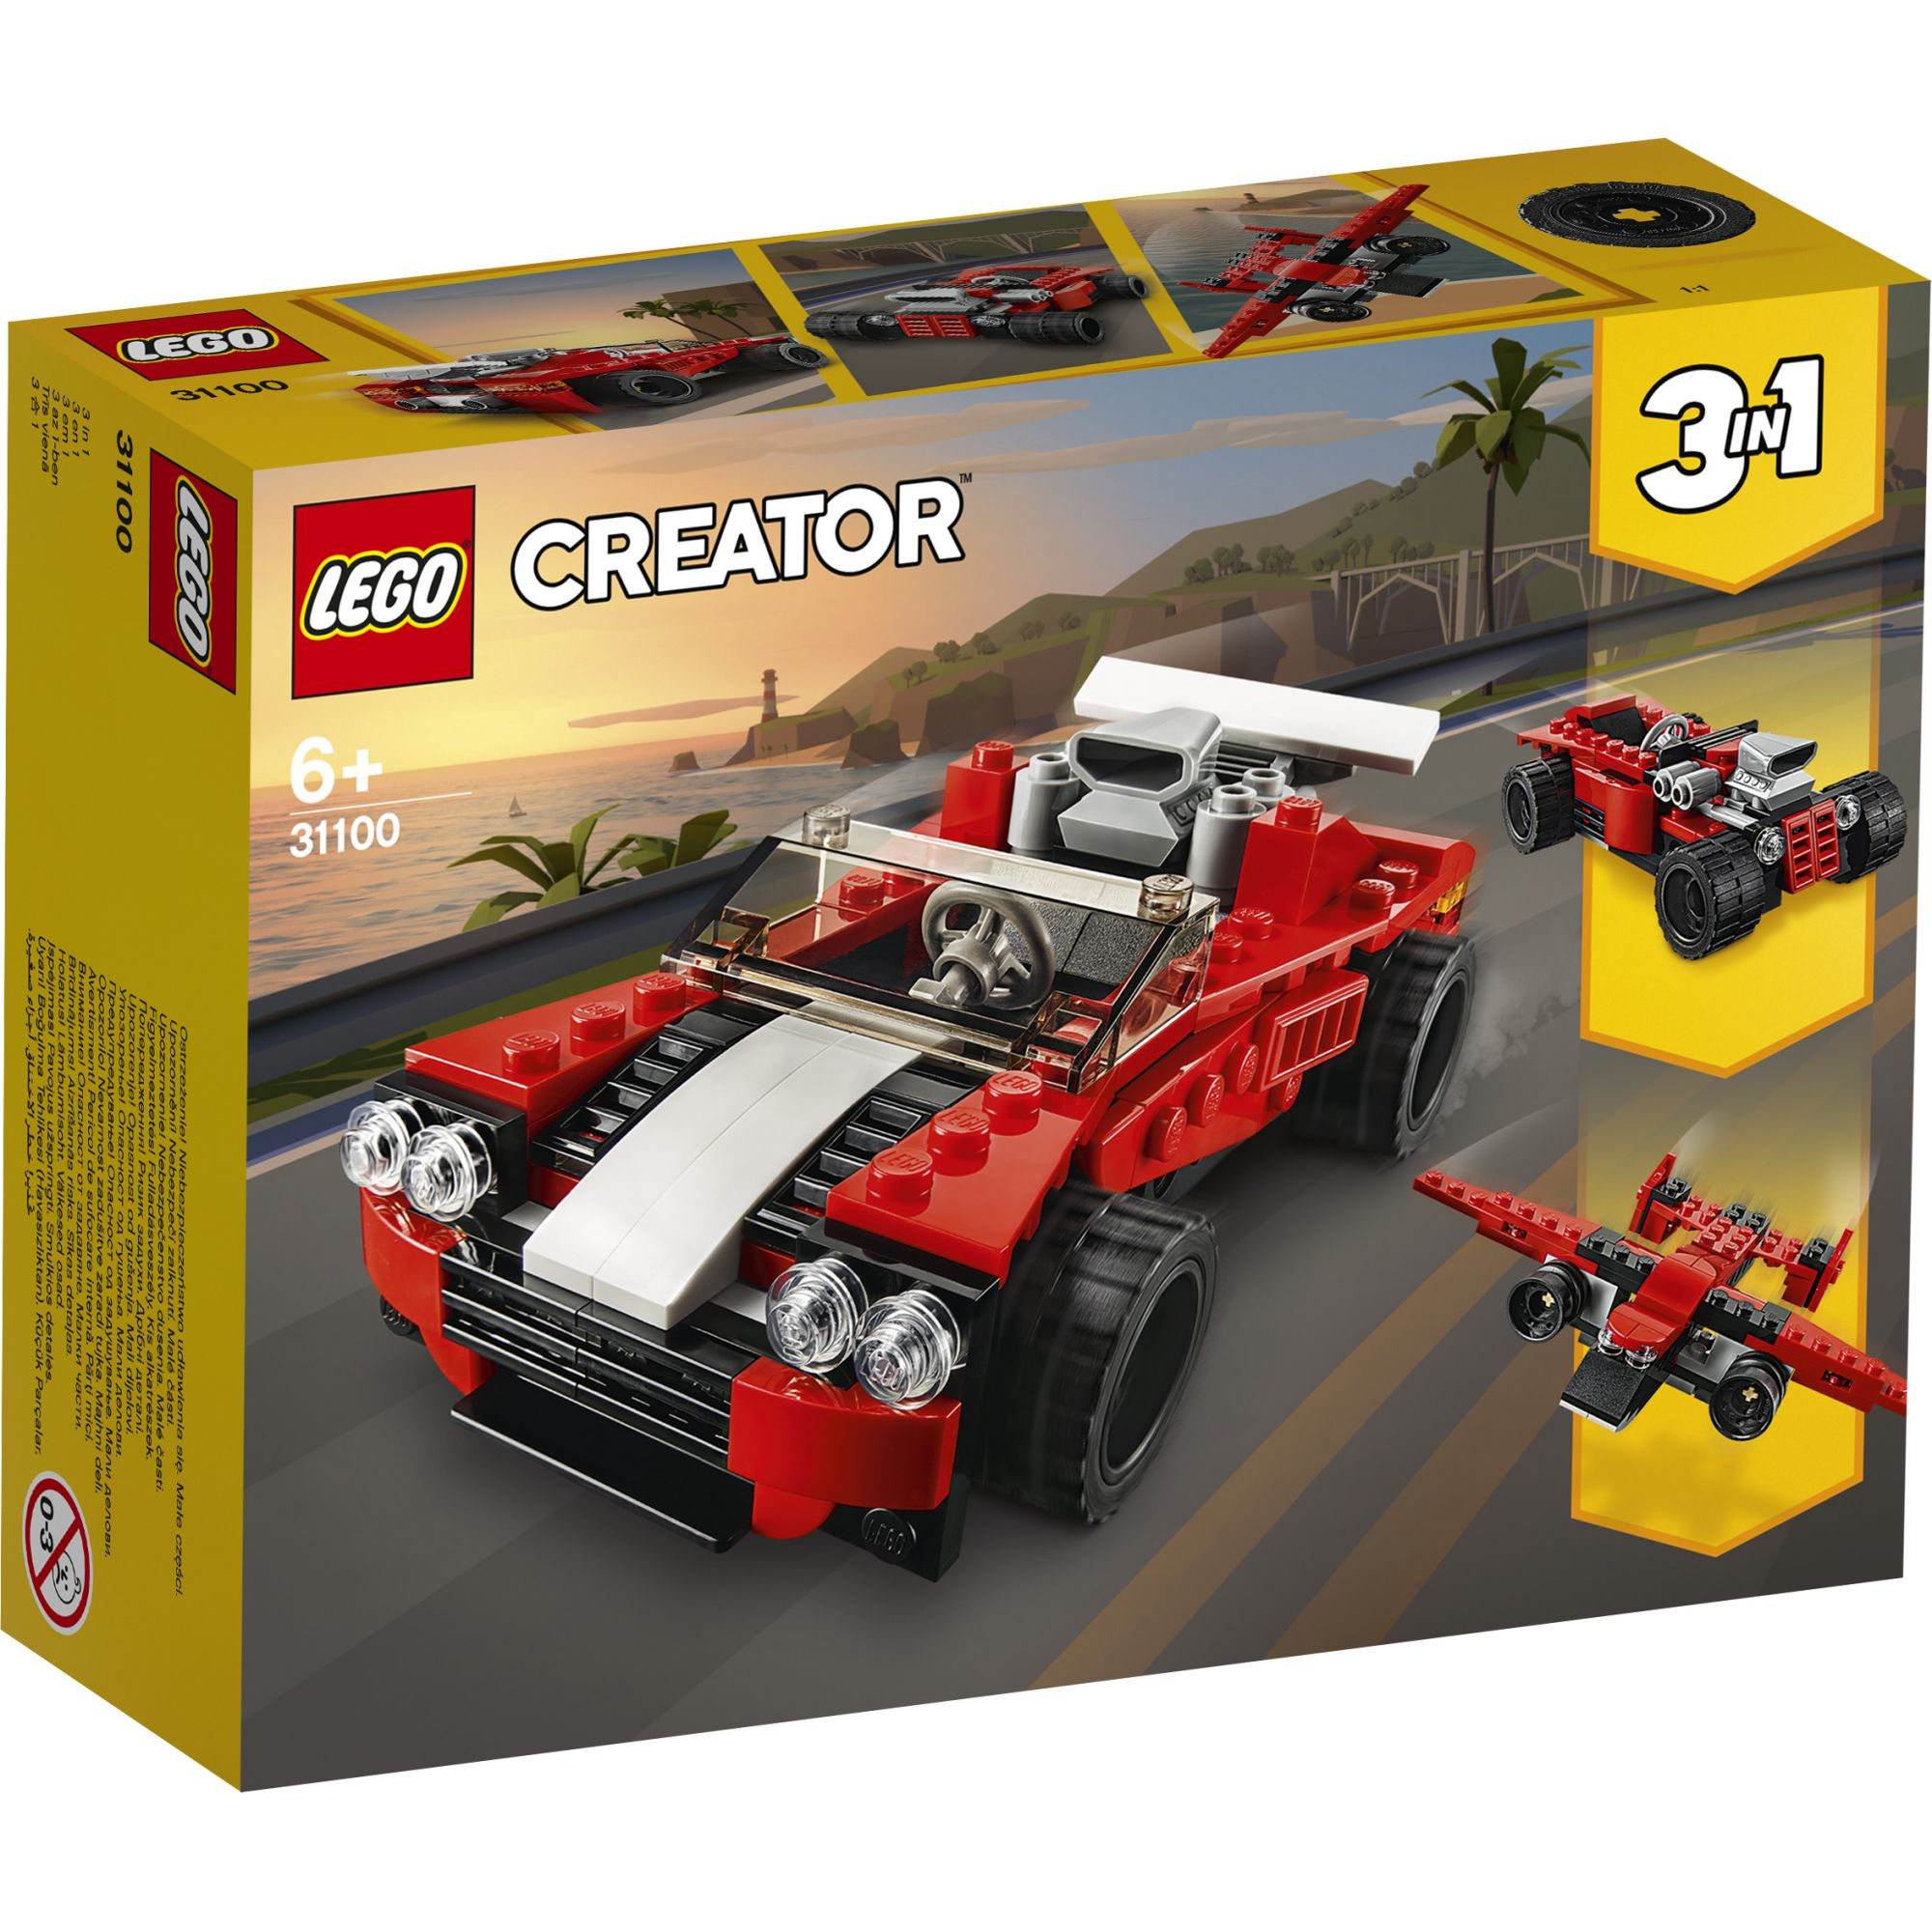 LEGO Creator Auto sportiva - 31100 LEGO CREATOR